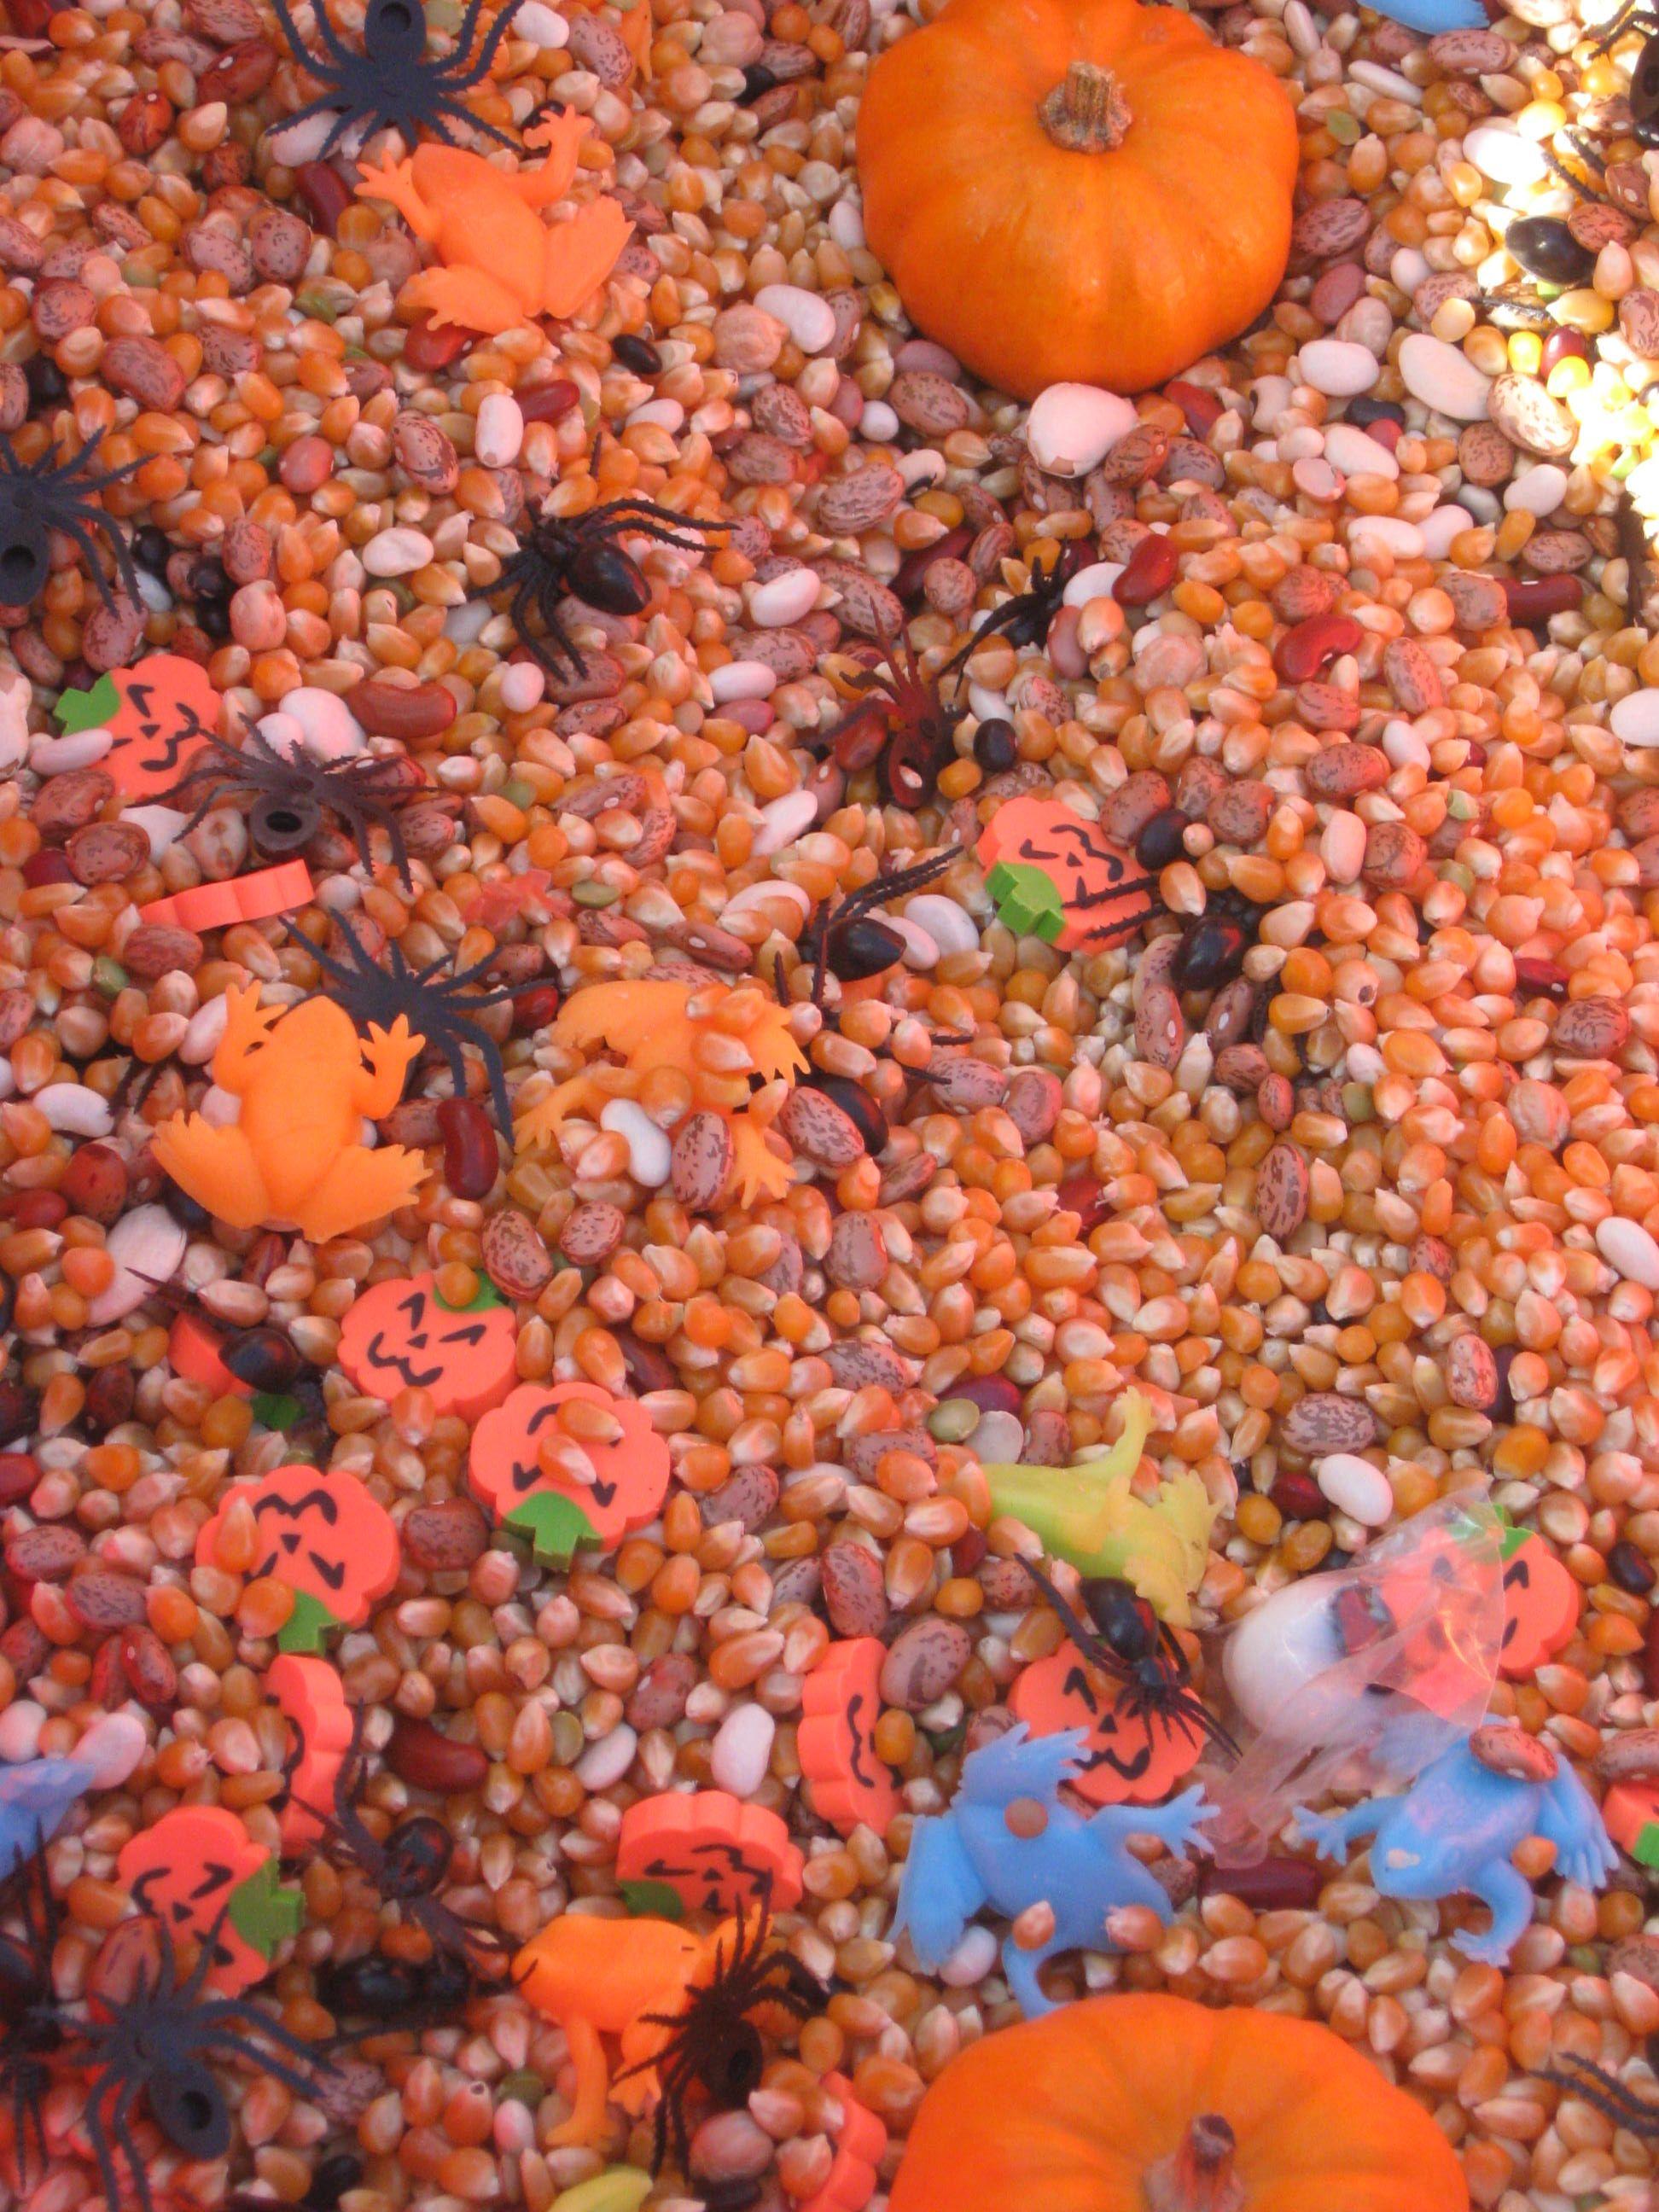 fall sensory table idea candy corn popcorn seeds pumpkins etc